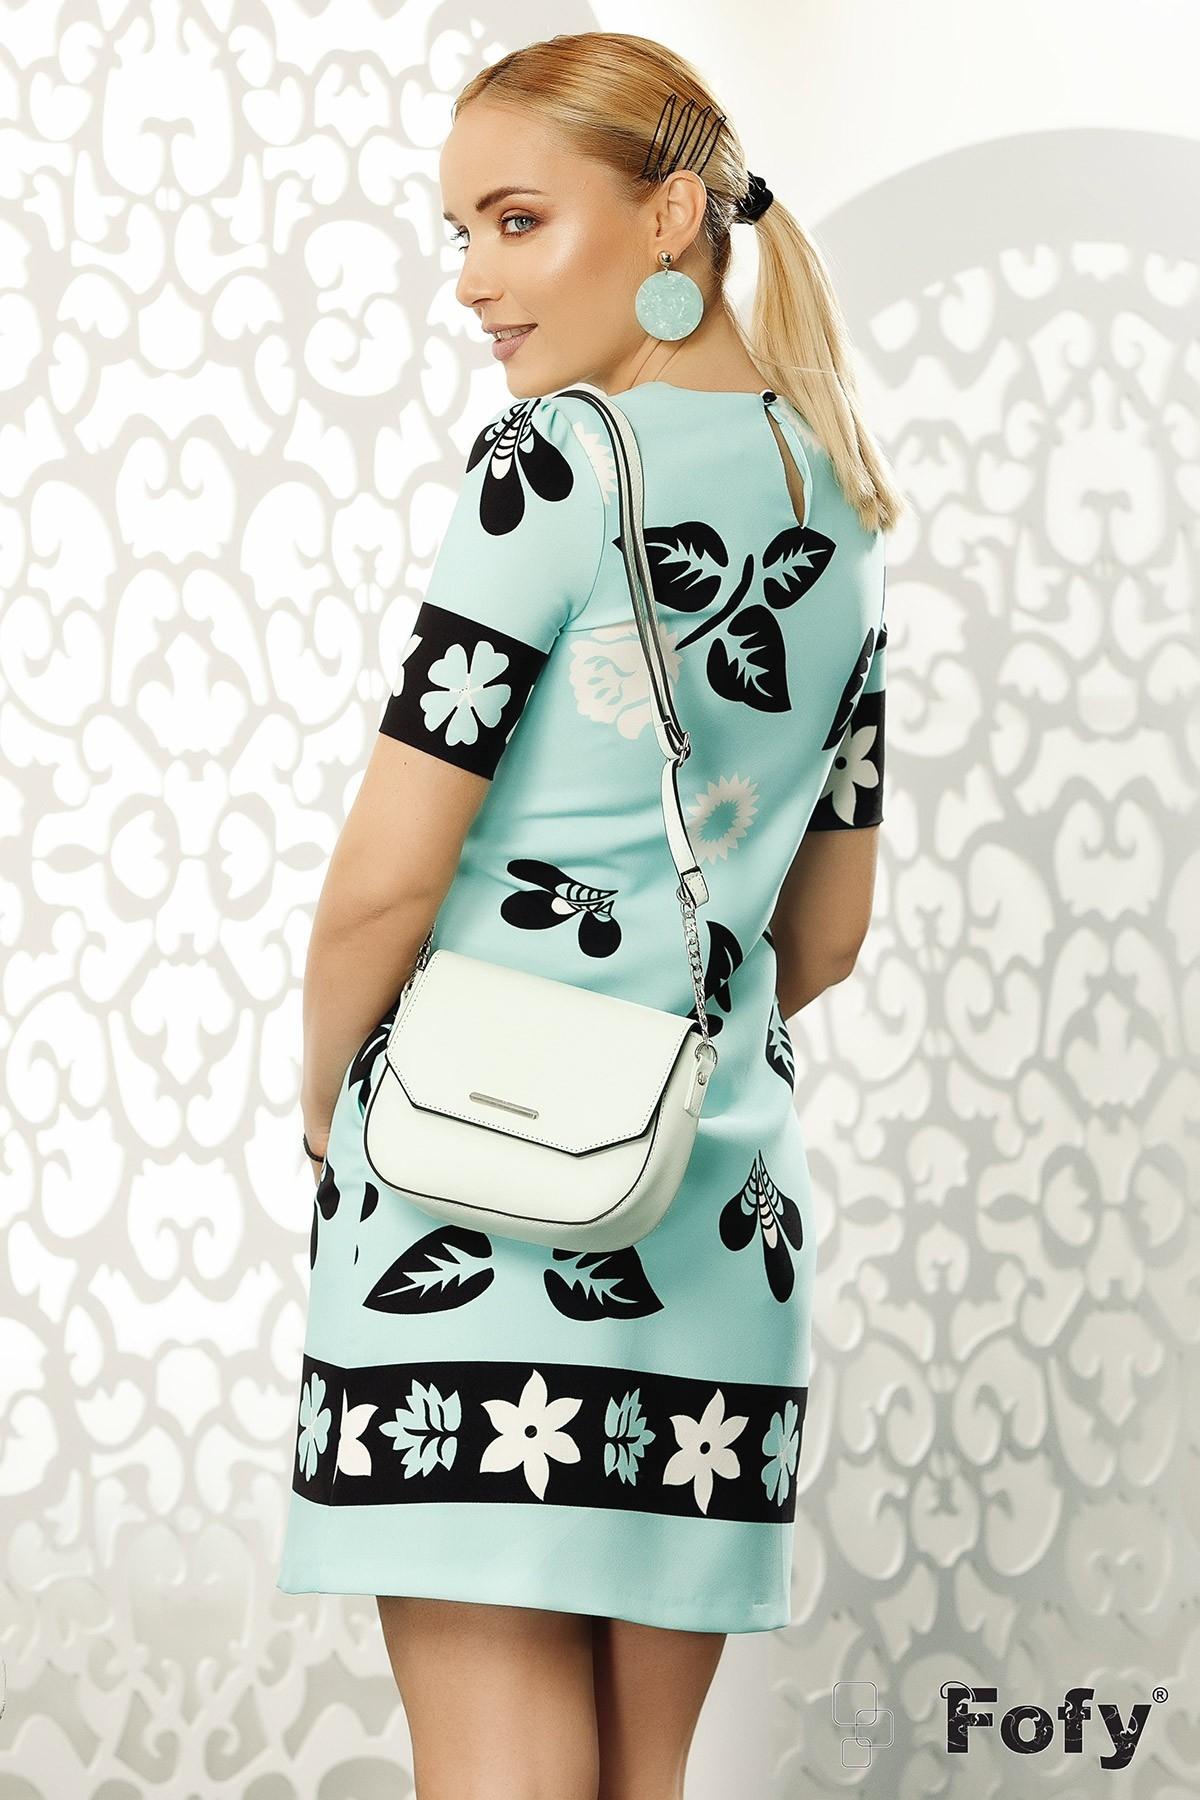 Rochie eleganta Fofy turcoaz cu imprimeu floral alb negru